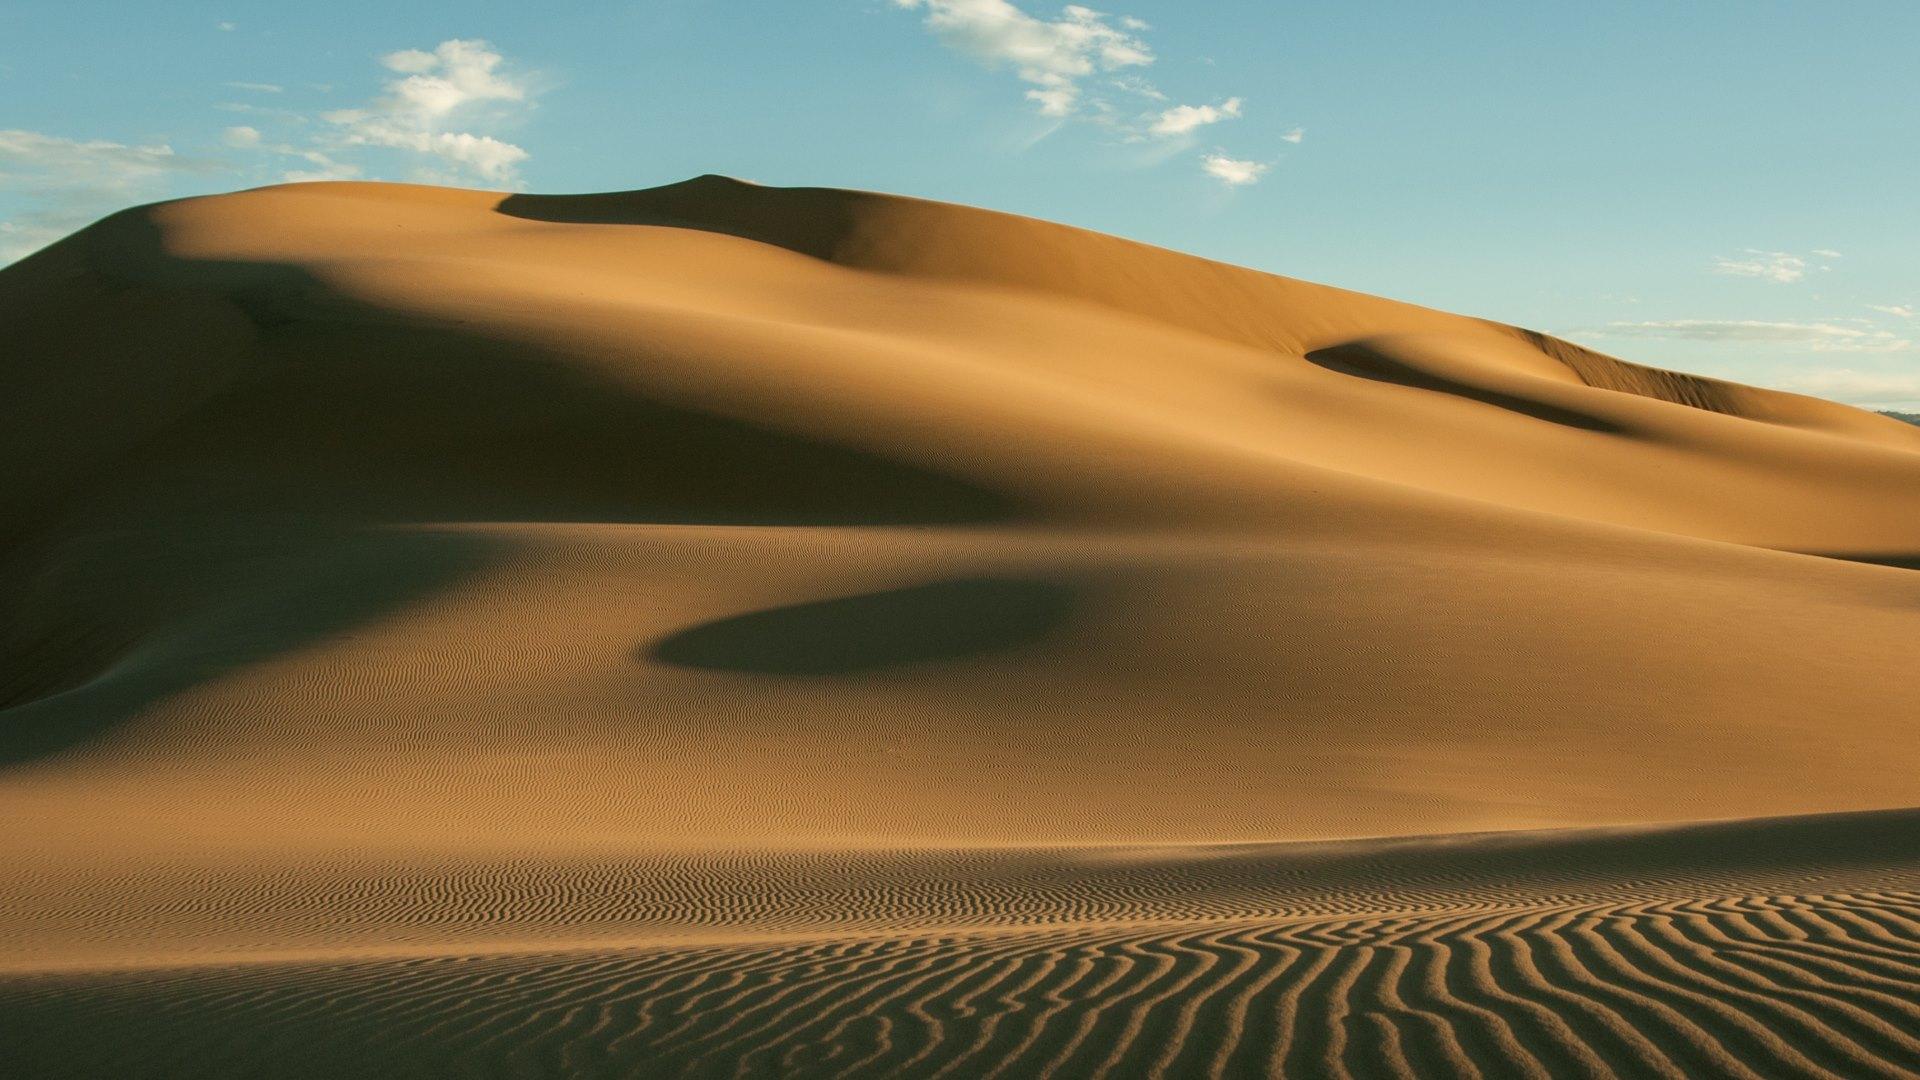 Sand dunes in the gobi desert wallpapers 183 4k hd desktop phone